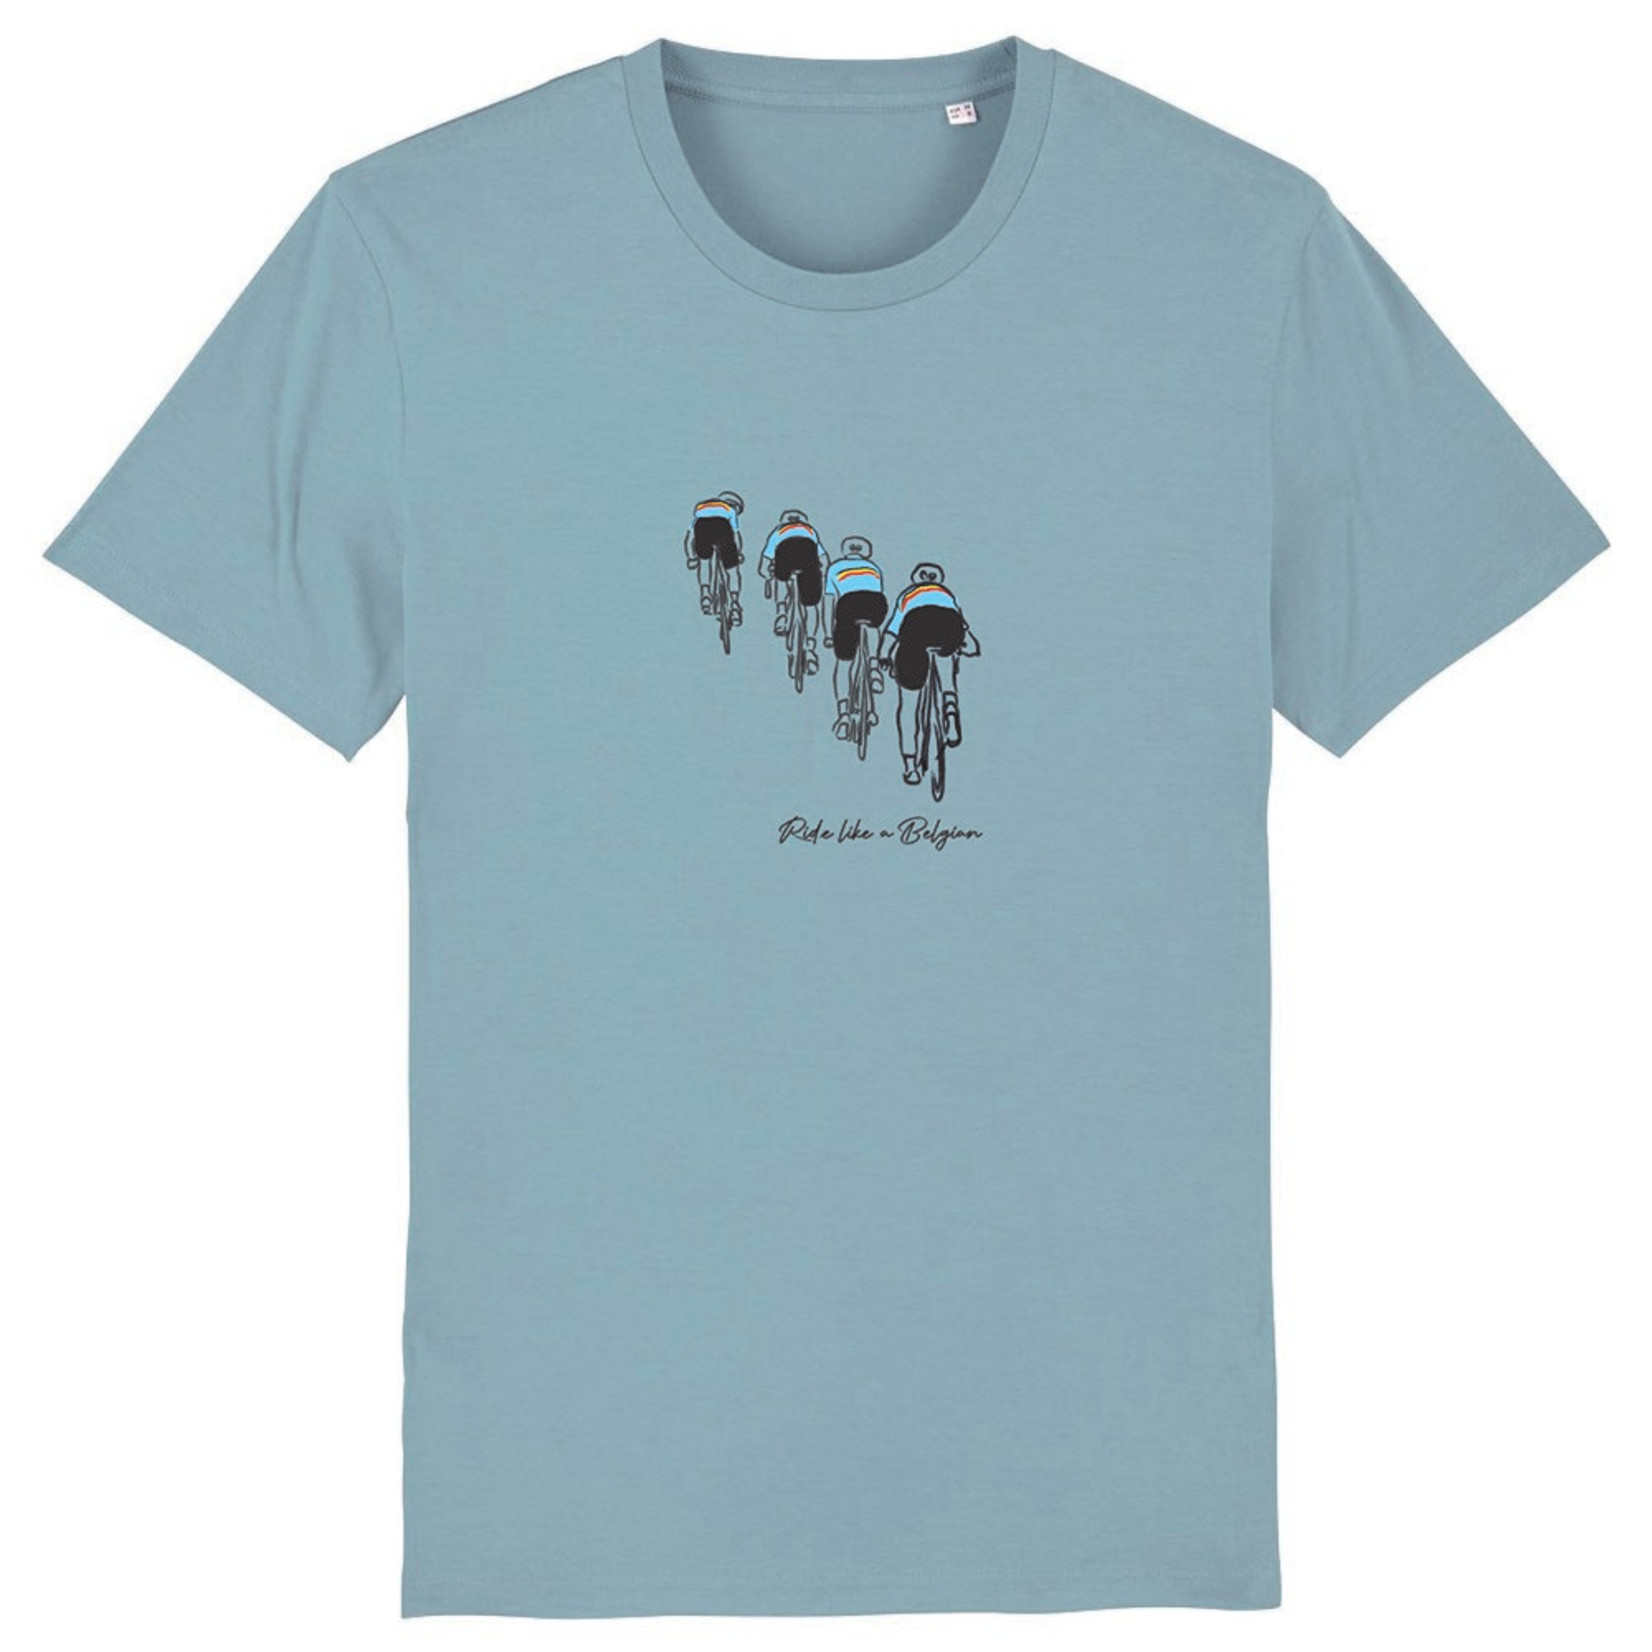 T-shirt 'Echelons' (blauw)